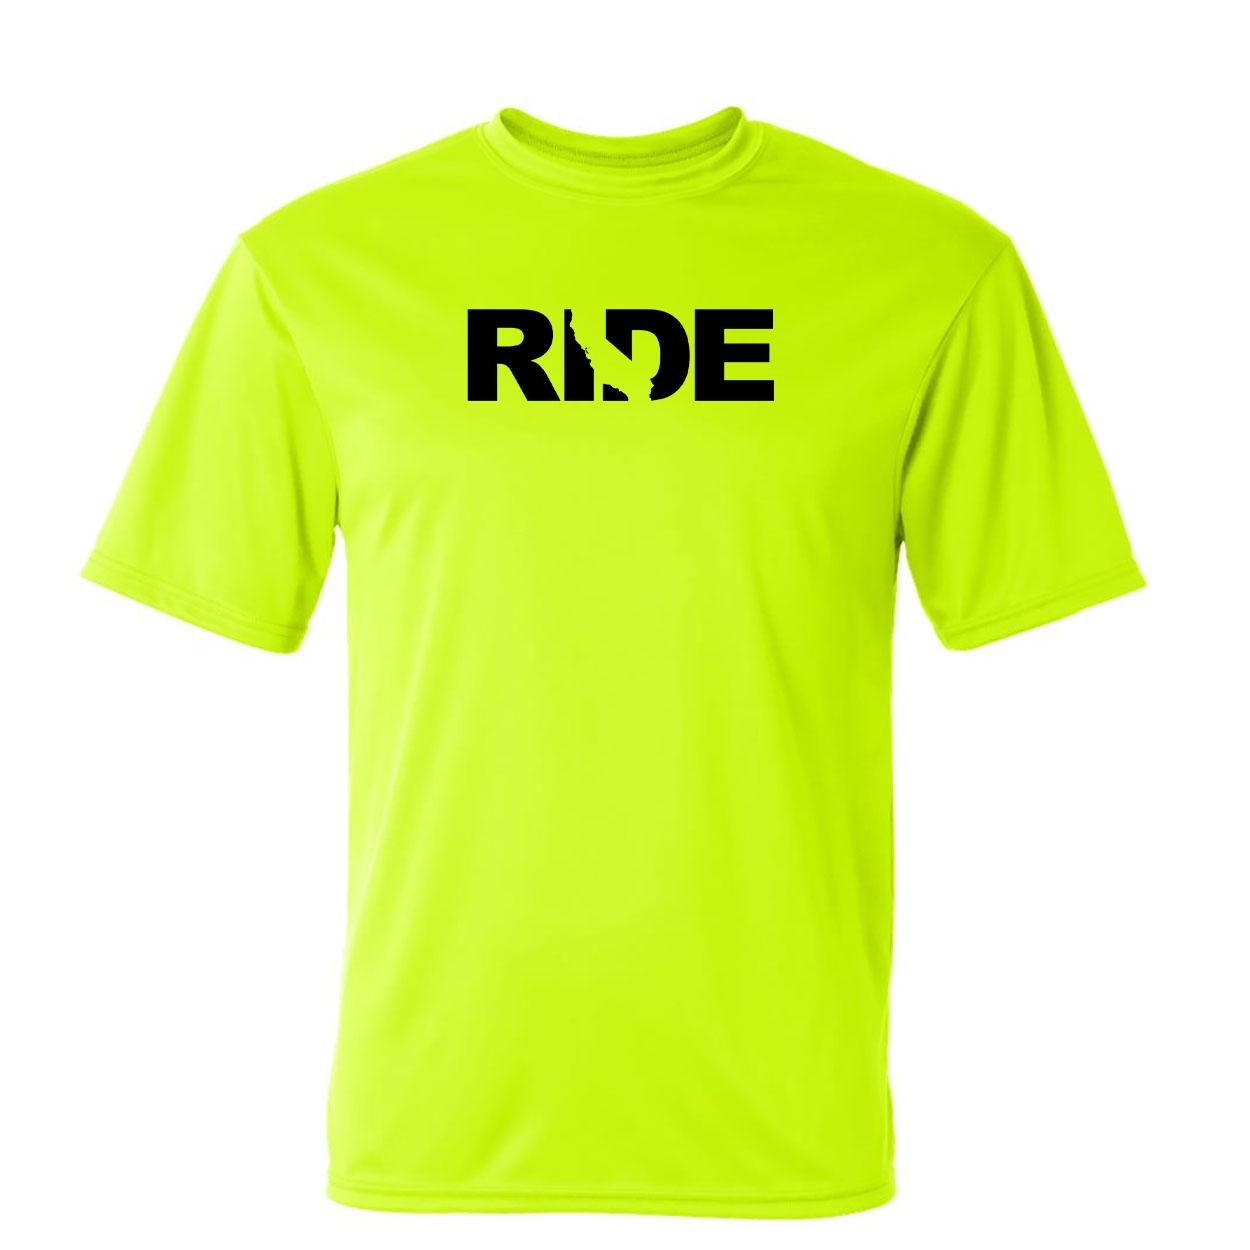 Ride California Classic Unisex Performance T-Shirt High Visibility Safety Yellow (Black Logo)